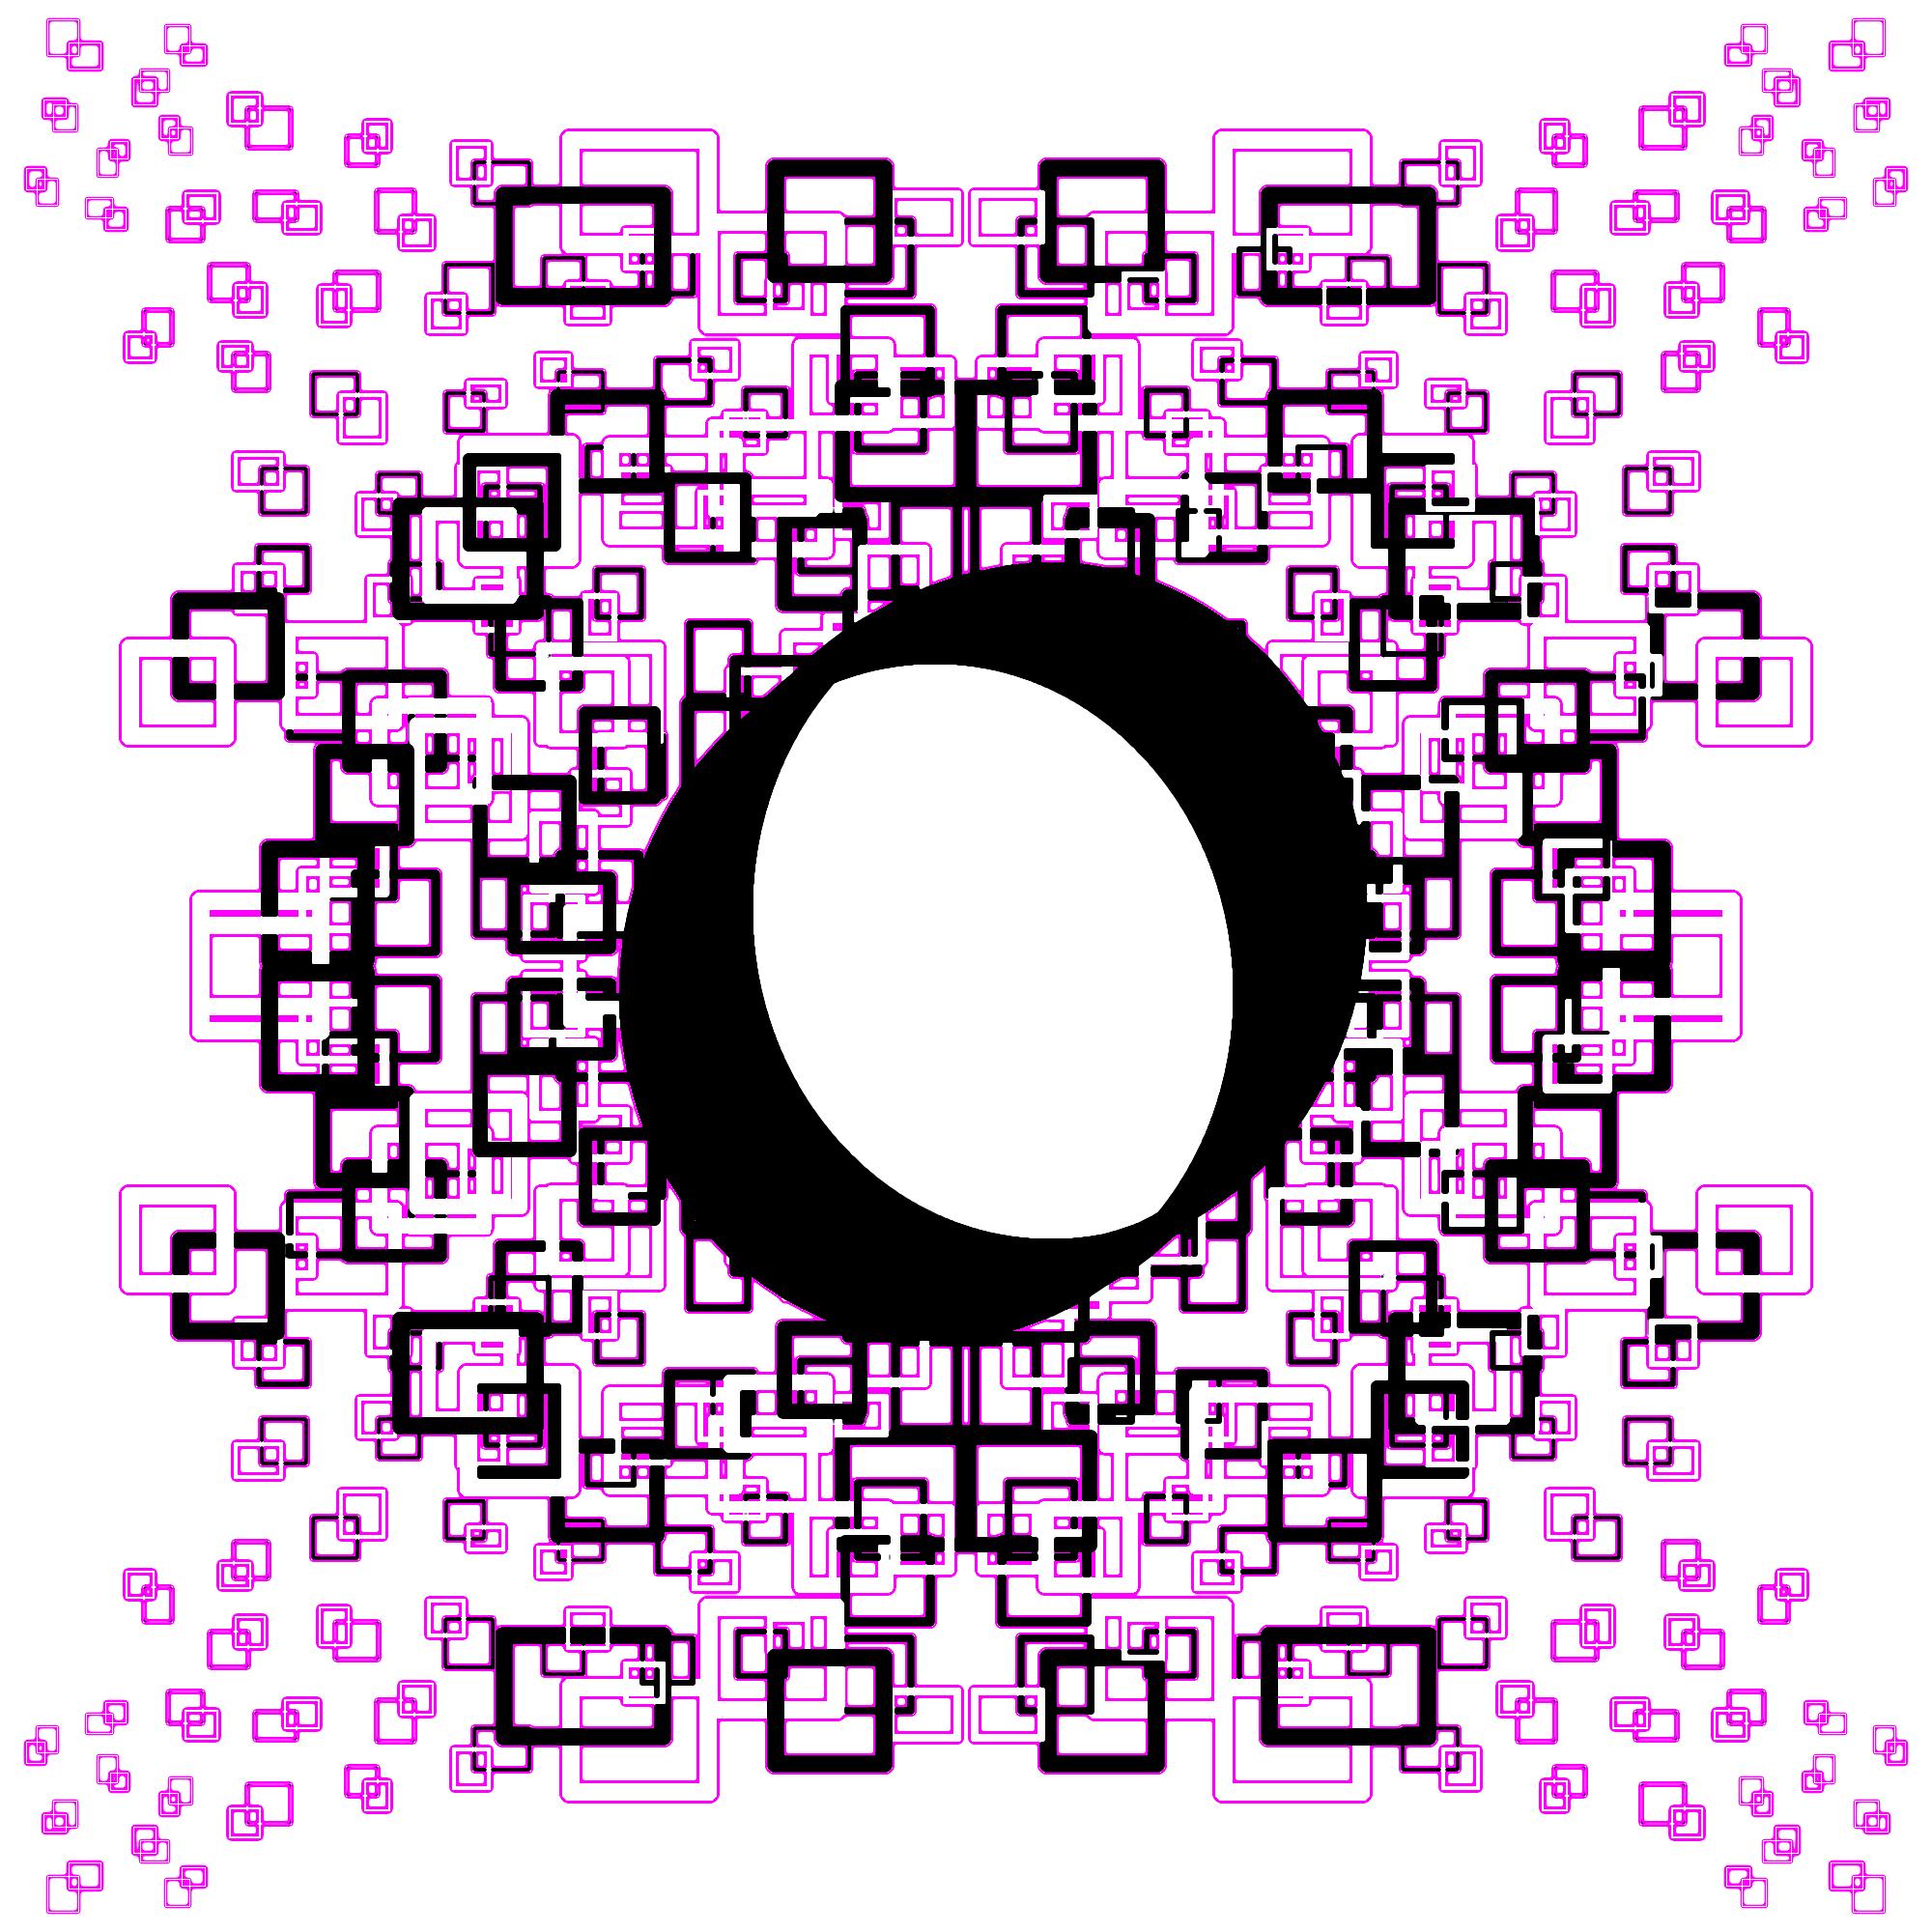 Digital Hole Big Symbol By Piggemz On Newgrounds